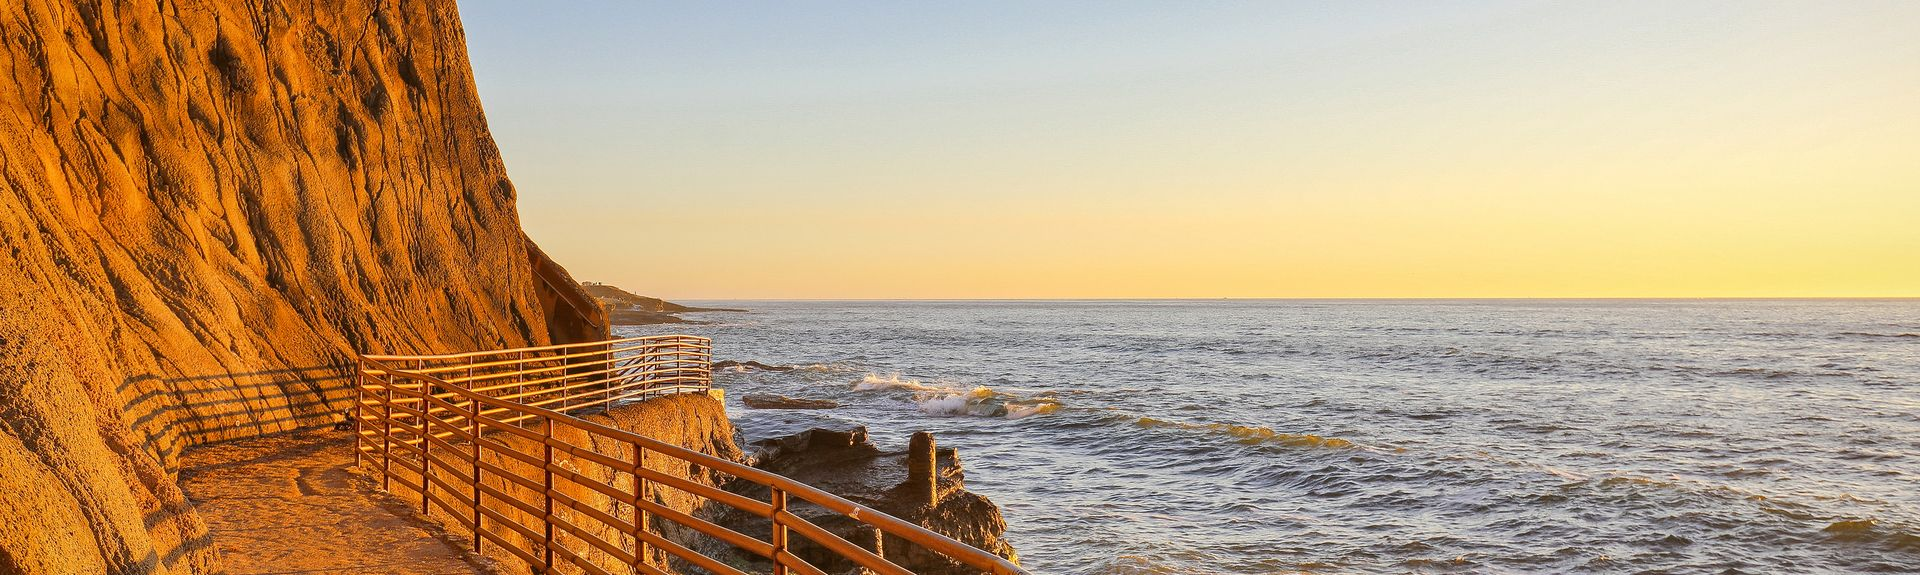 Crystal Pier, San Diego, California, United States of America